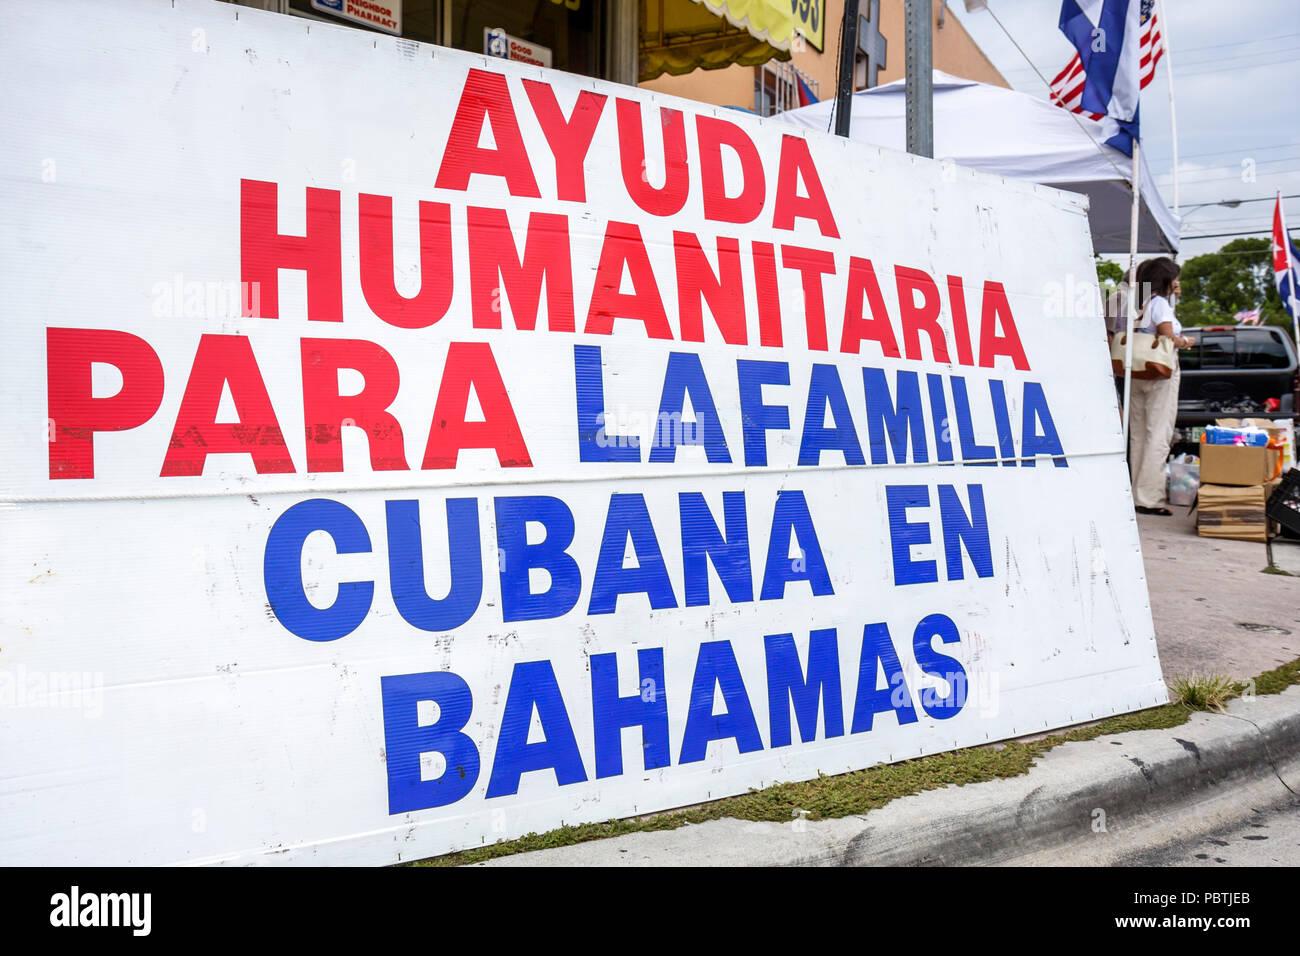 Miami Florida Little Havana Calle Ocho banner activist human rights organization humanitarian aid Cubans Bahamas Spanish languag - Stock Image